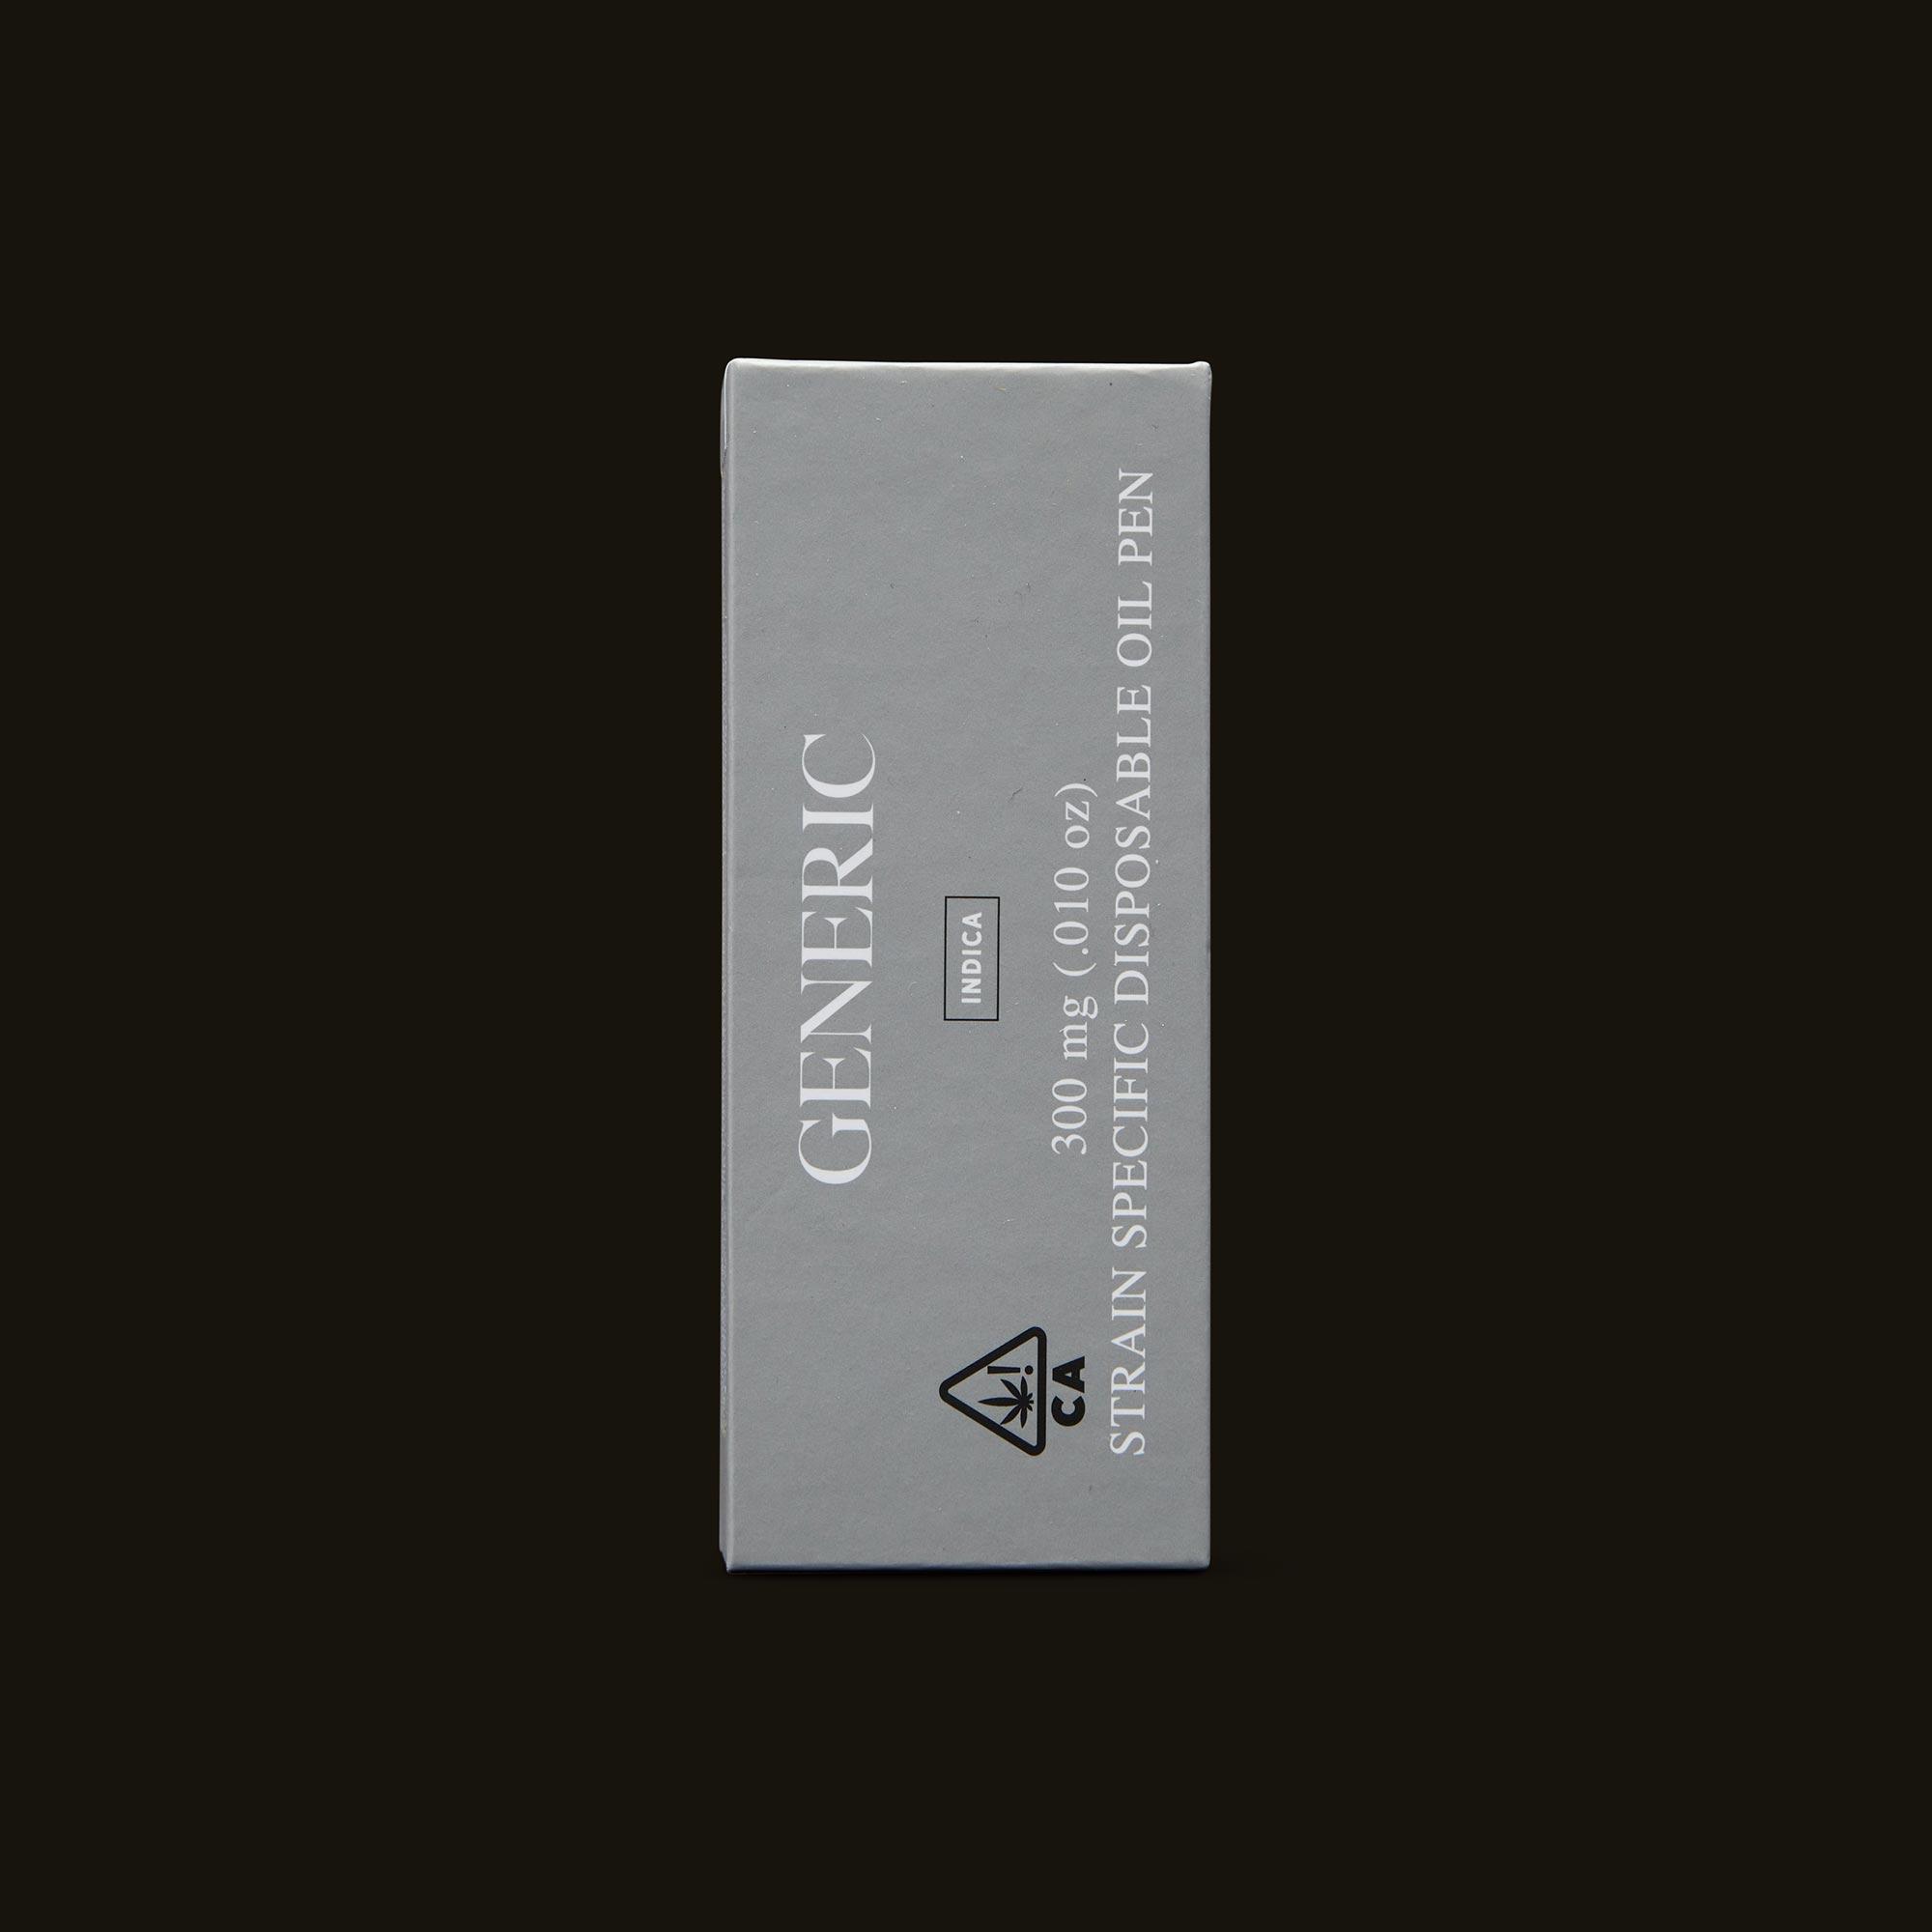 Generic Diamond OG Disposable Front Packaging